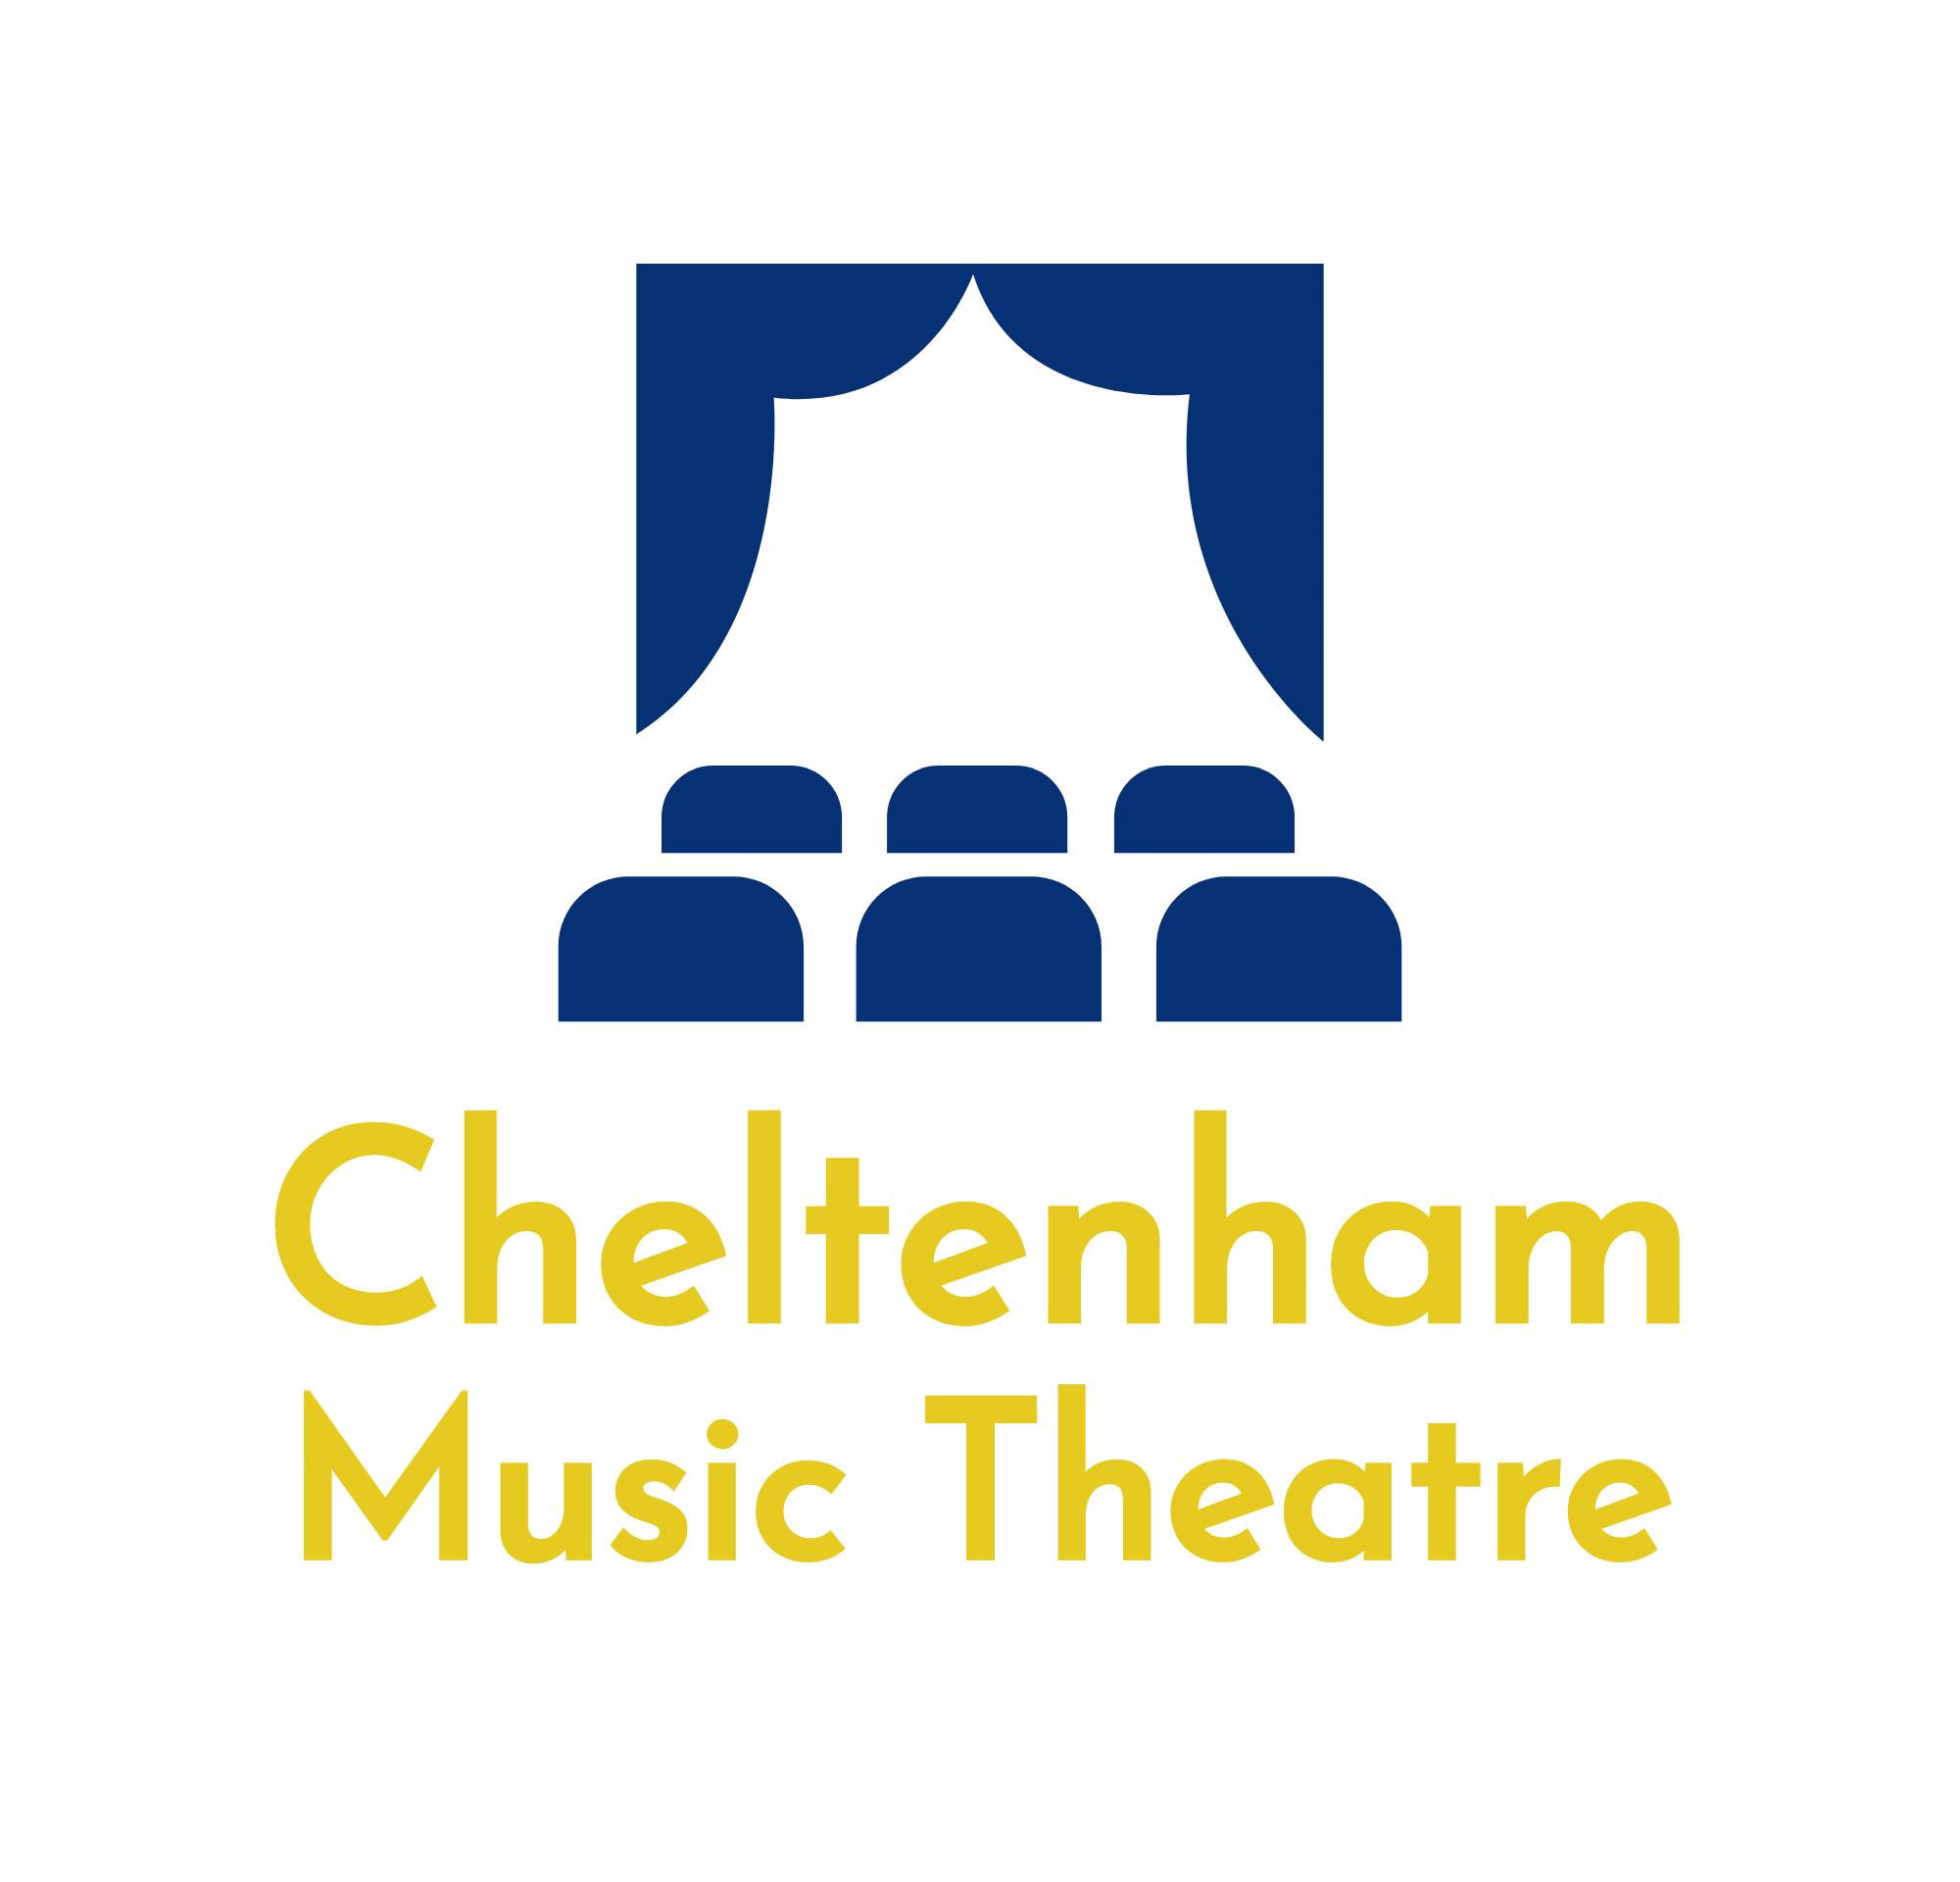 Cheltenham Music Theatre logo.png